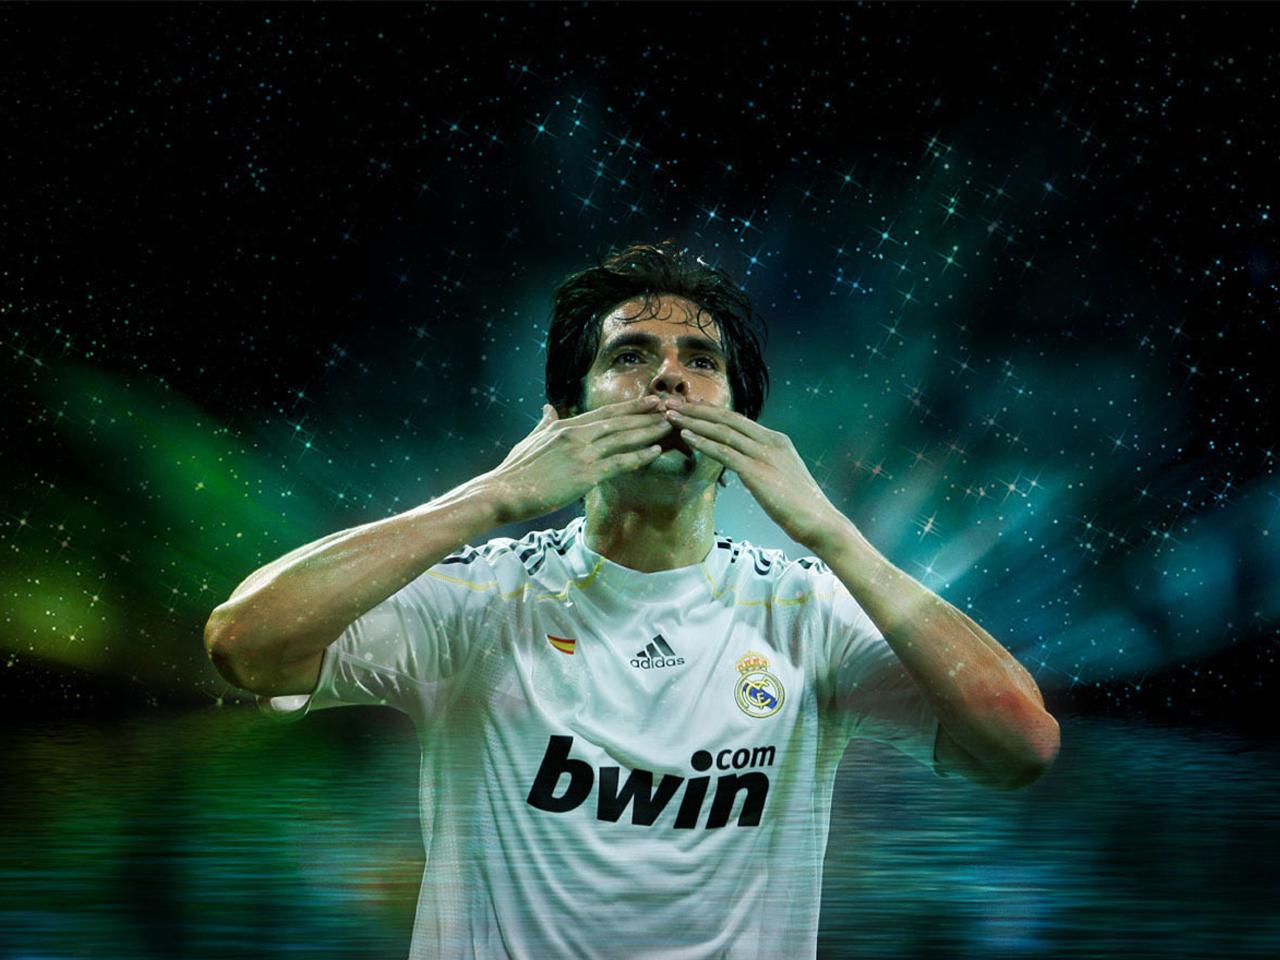 http://1.bp.blogspot.com/-Qeoi79ZKAGc/T2m1zqddzfI/AAAAAAAAAD8/0BDeRAopIKM/s1600/Ricardo-Kaka-Wallpaper-3-Real-Madrid-Midfielder.jpg